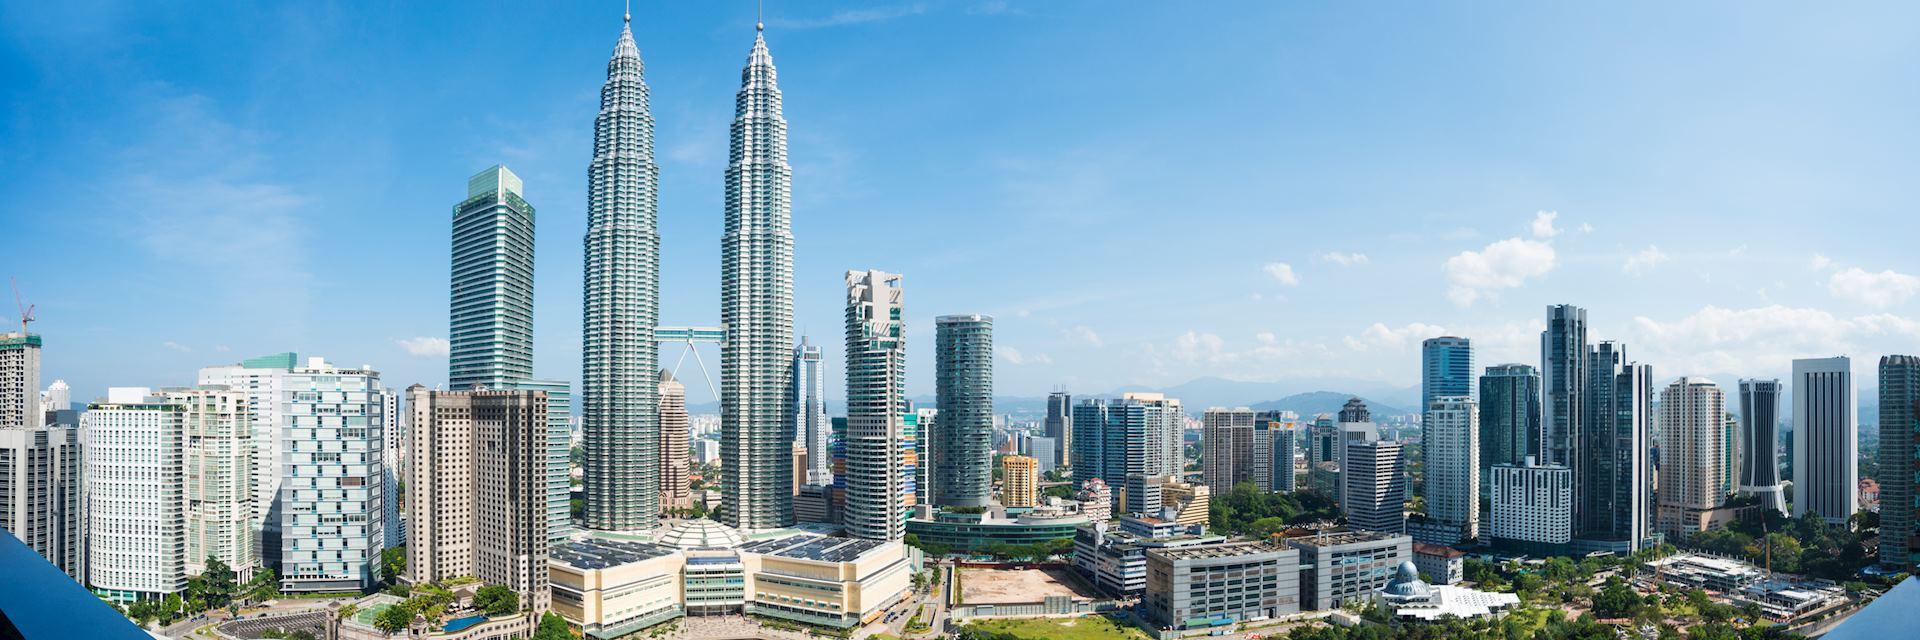 Skyline of Kuala Lumpur with the Petronas Towers